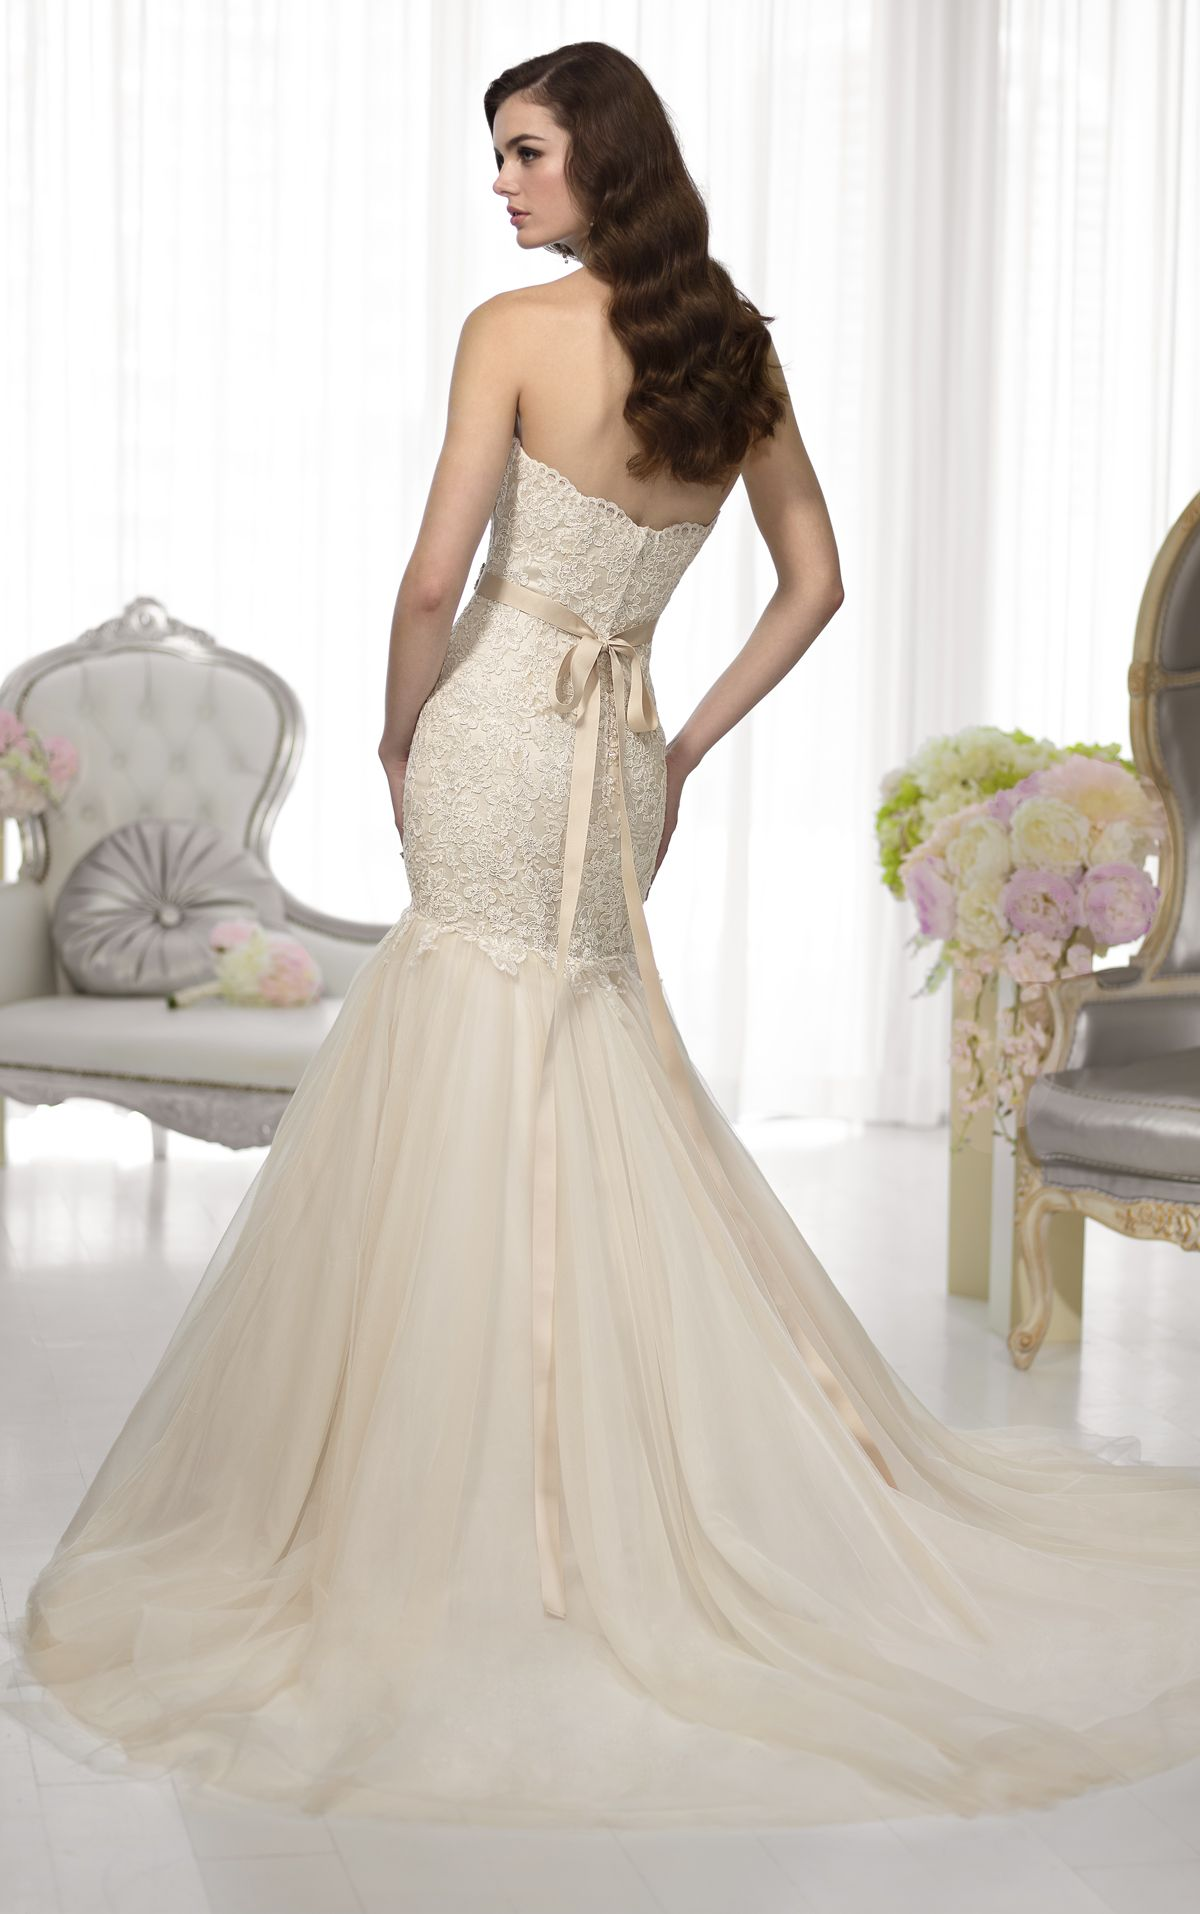 Essense of Australia Wedding Dresses 2014 Collection | Wedding ...